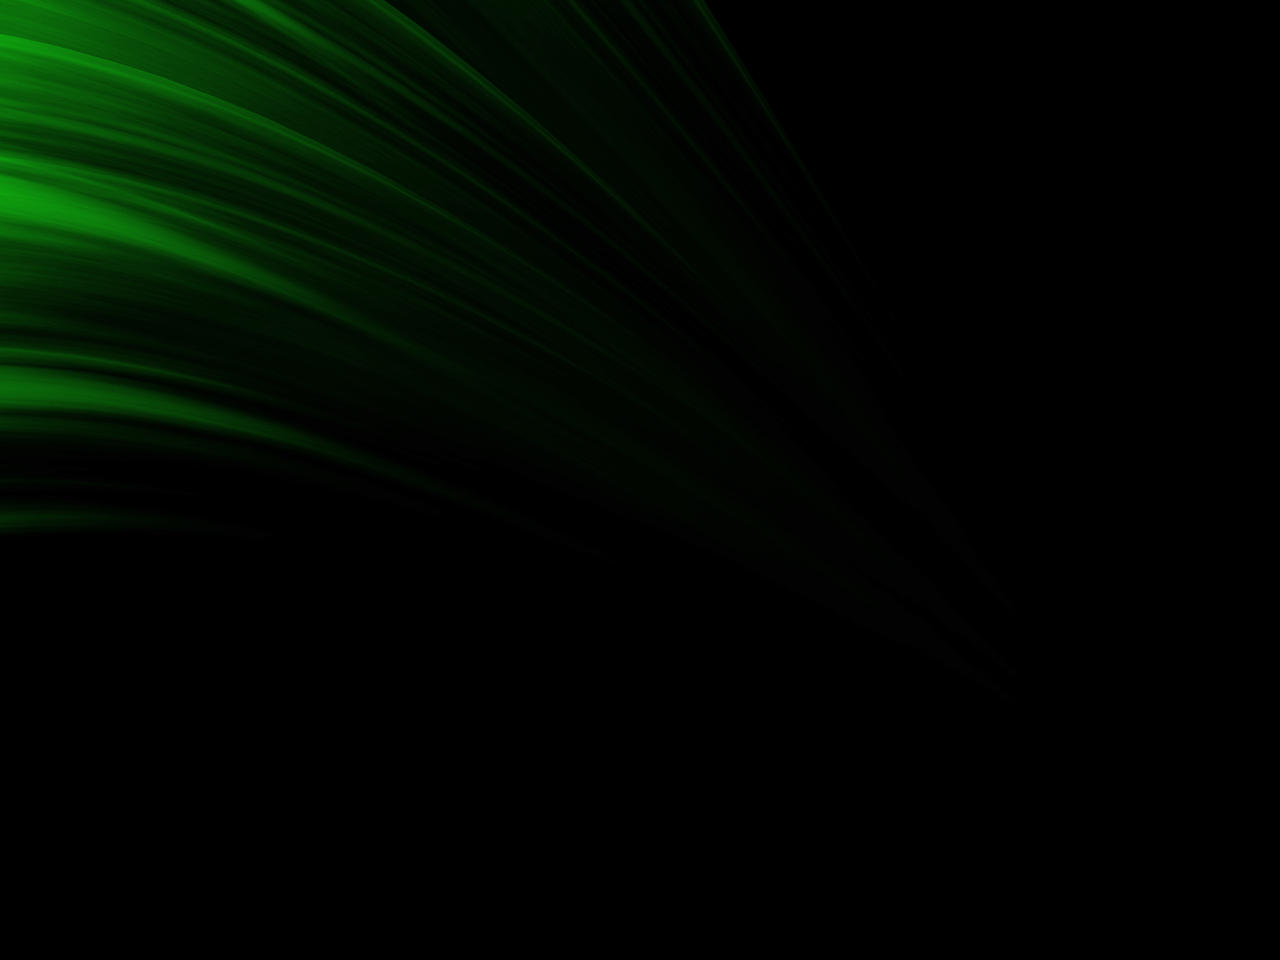 Green Fibre by SaiduA